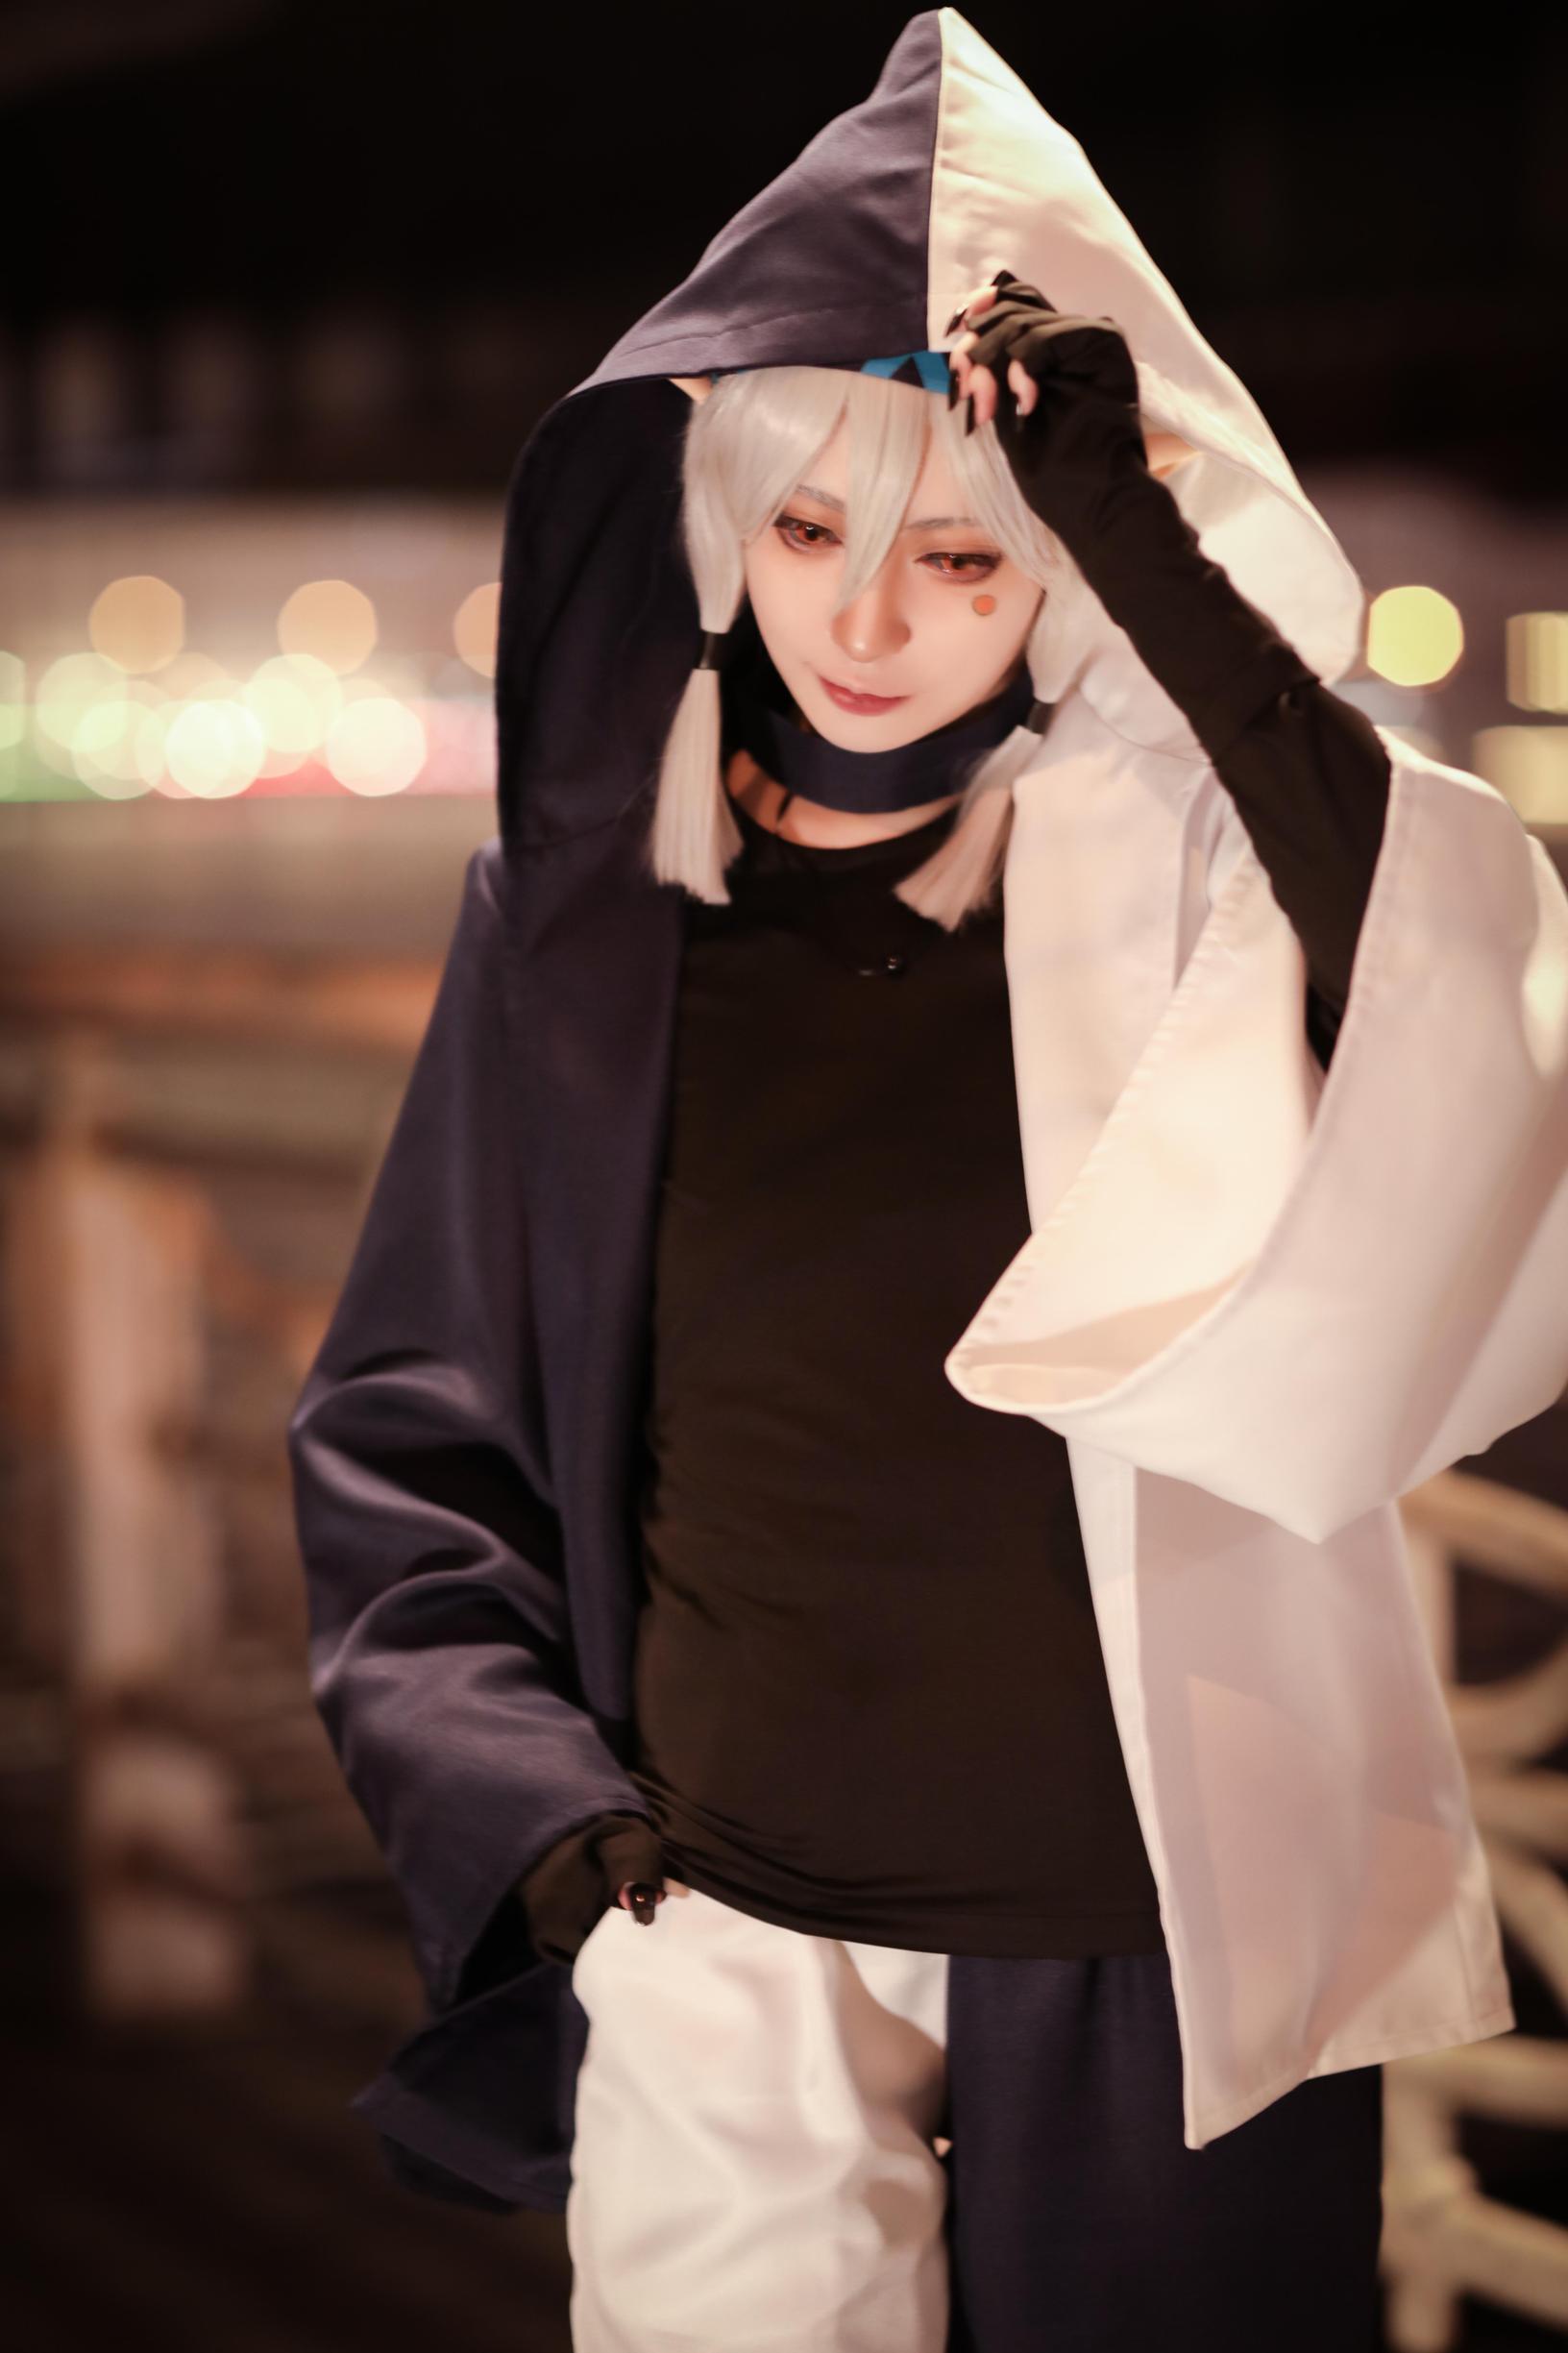 《凹凸世界》正片cosplay【CN:等待幸运の恒星】-第9张